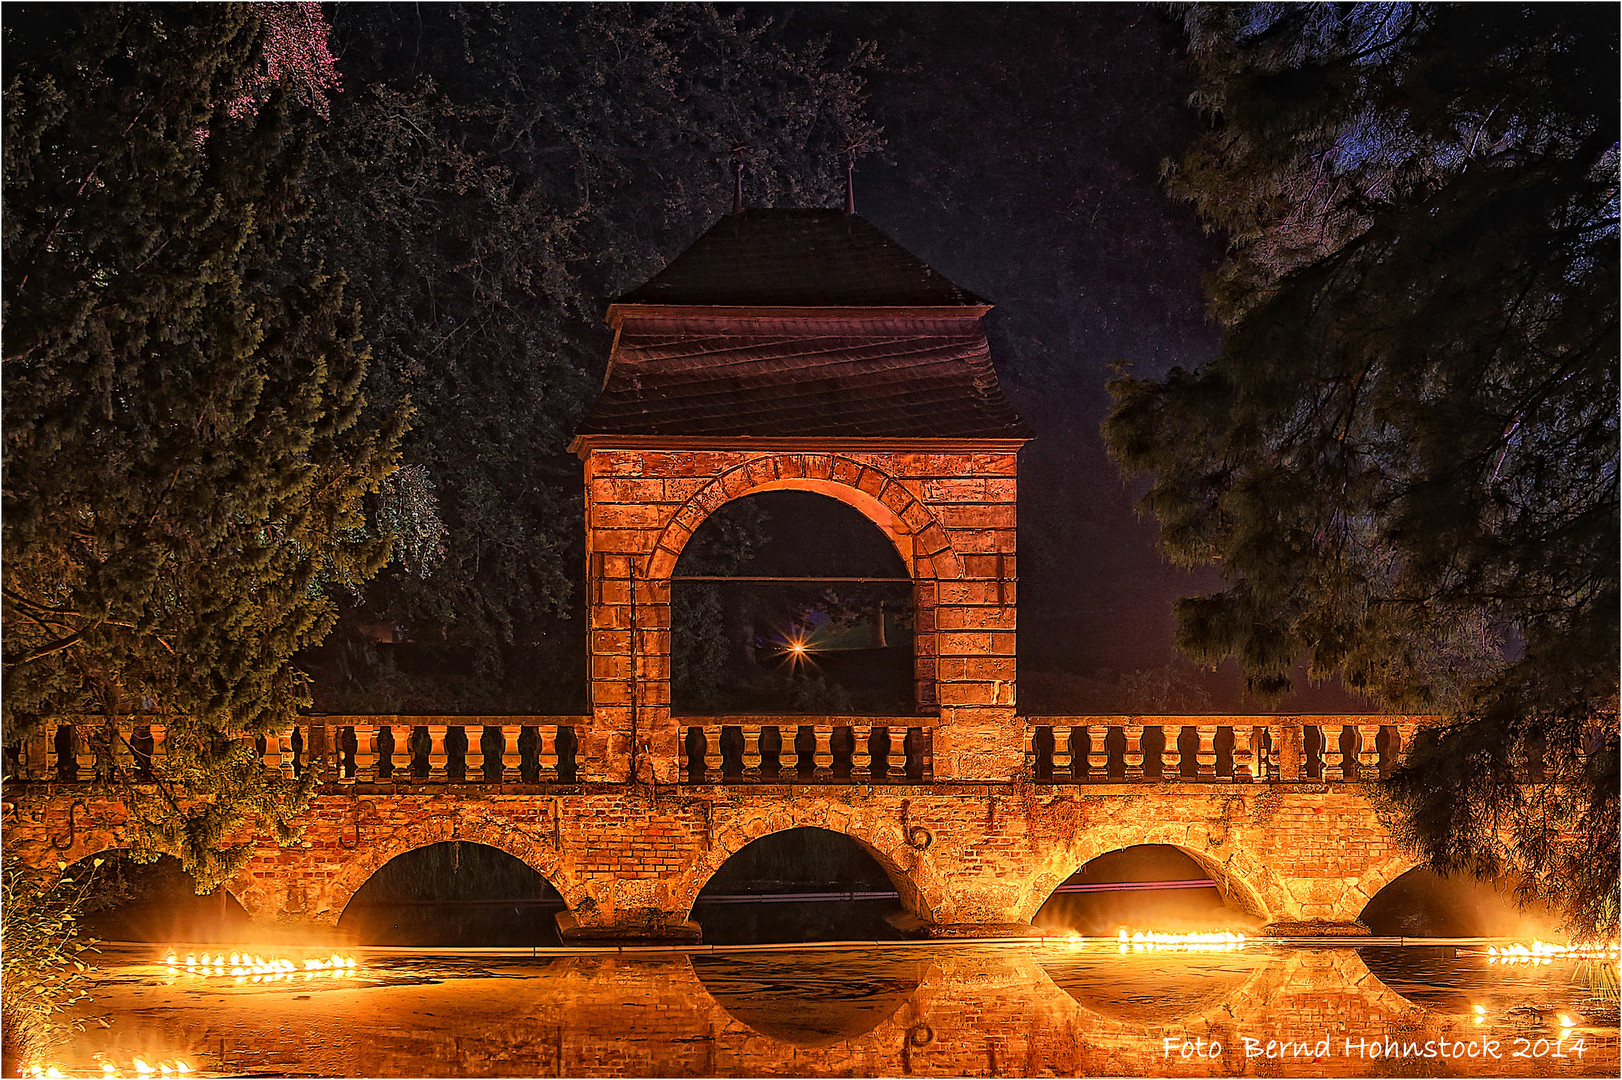 Hochzeitsbrücke Schloß Dyck 2014 ...